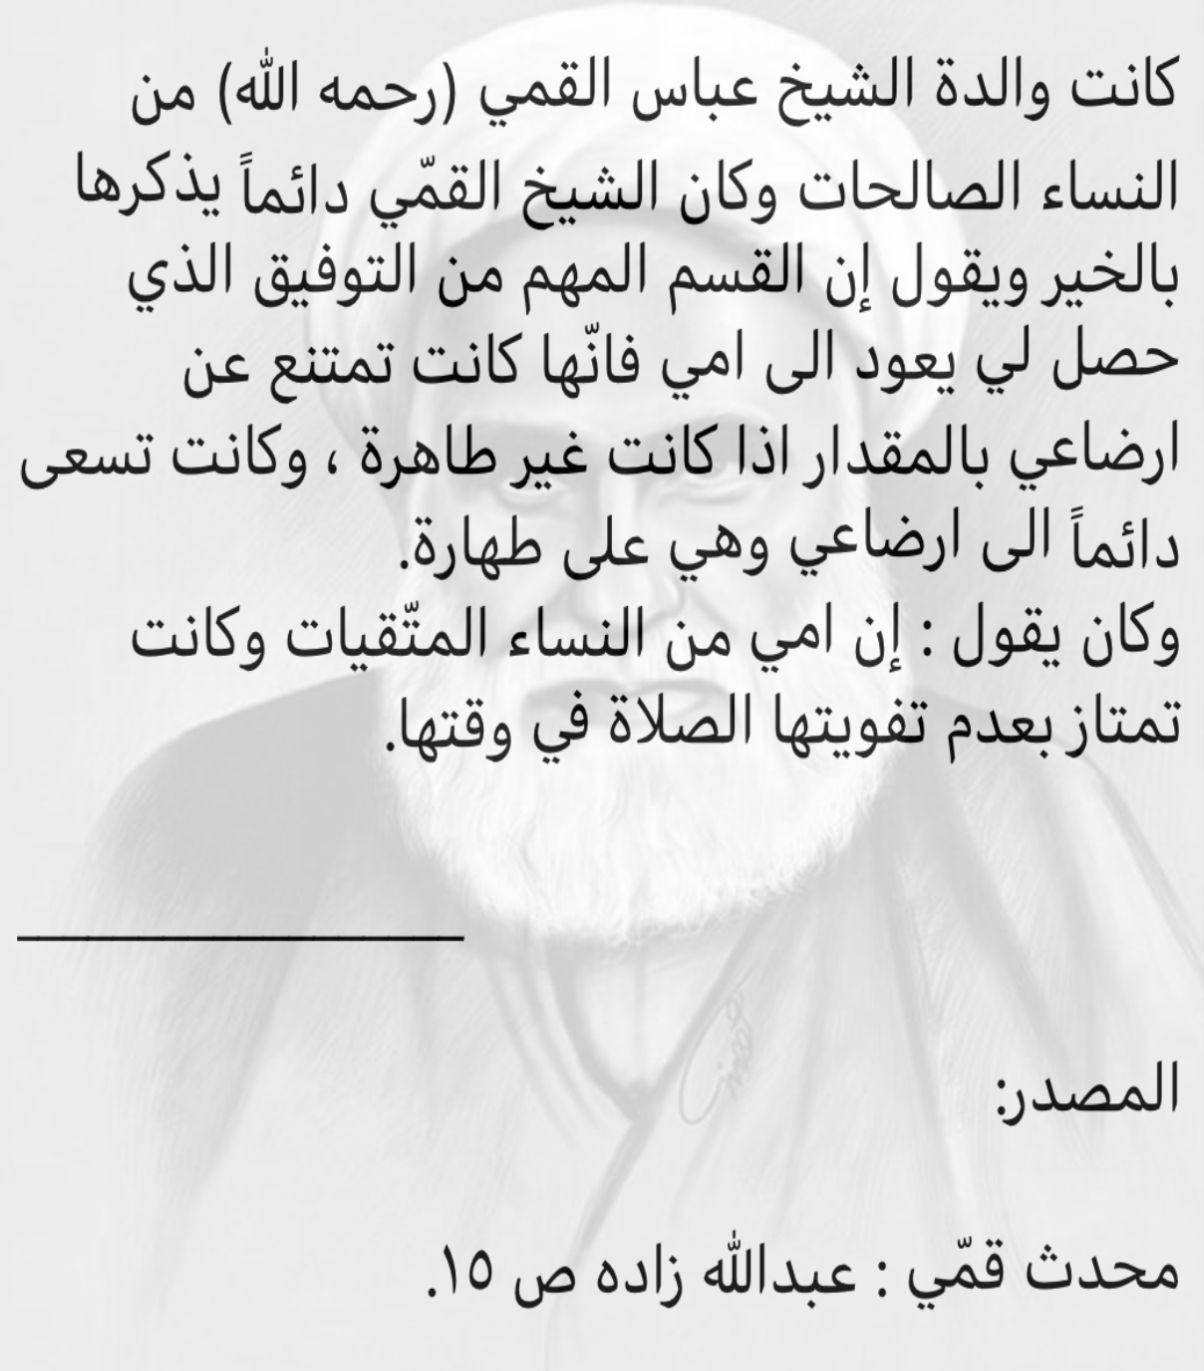 Pin By فاطمة الصافي الموسوي On أنمايخشى الله من عباده العلماء Arabic Quotes Quotes Personalized Items